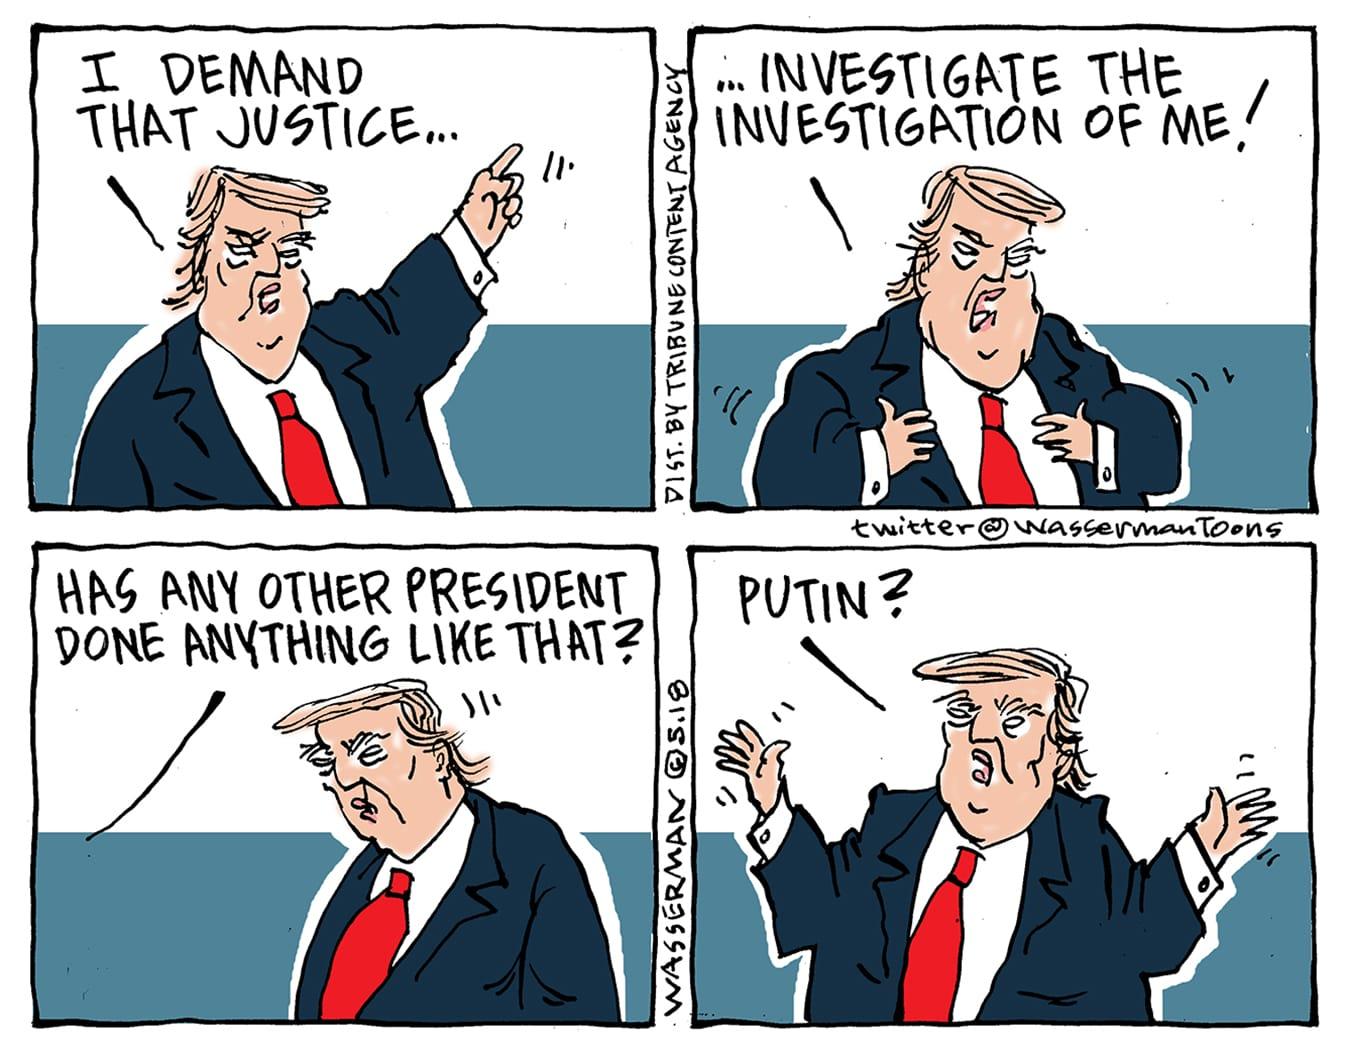 May 26: Trump Investigation